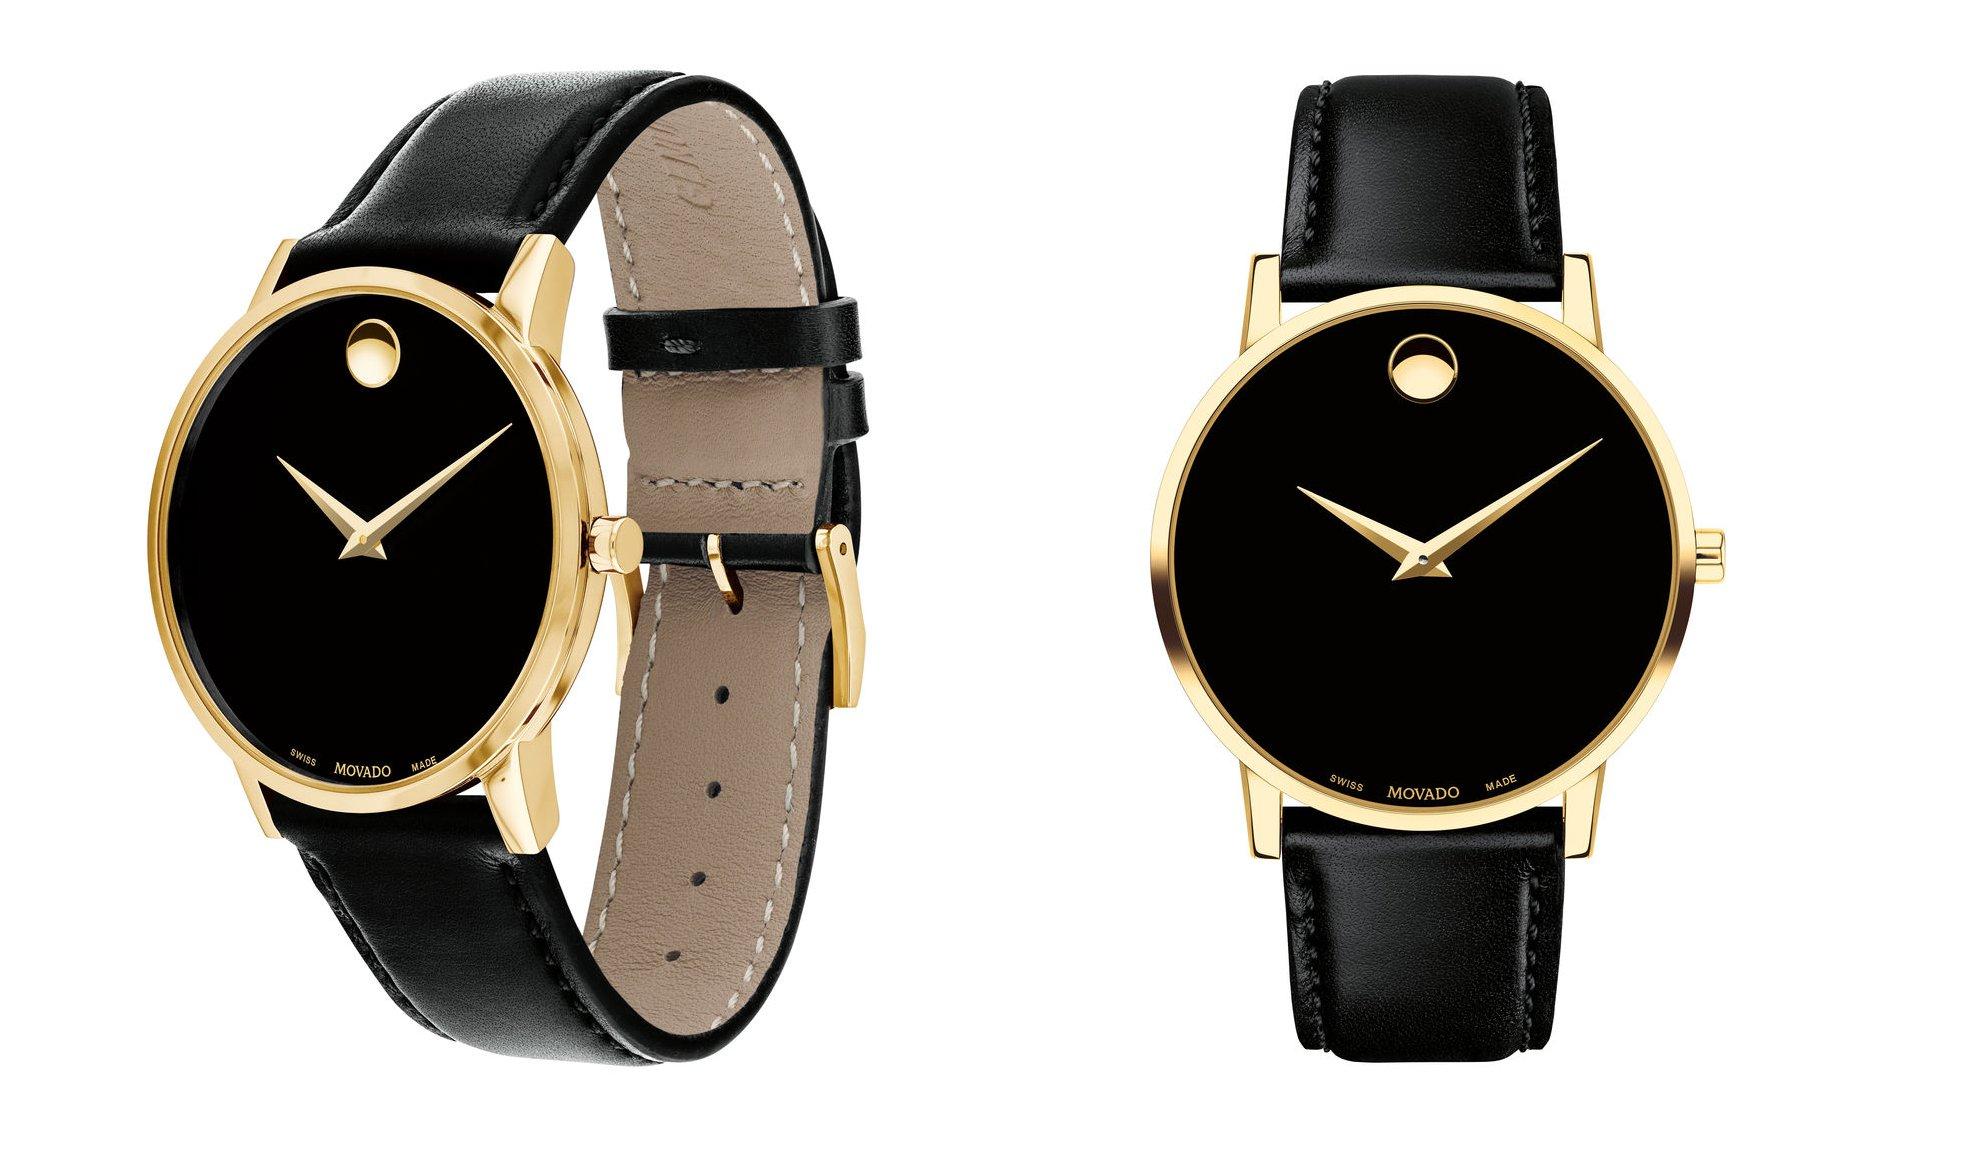 A Movado watch.